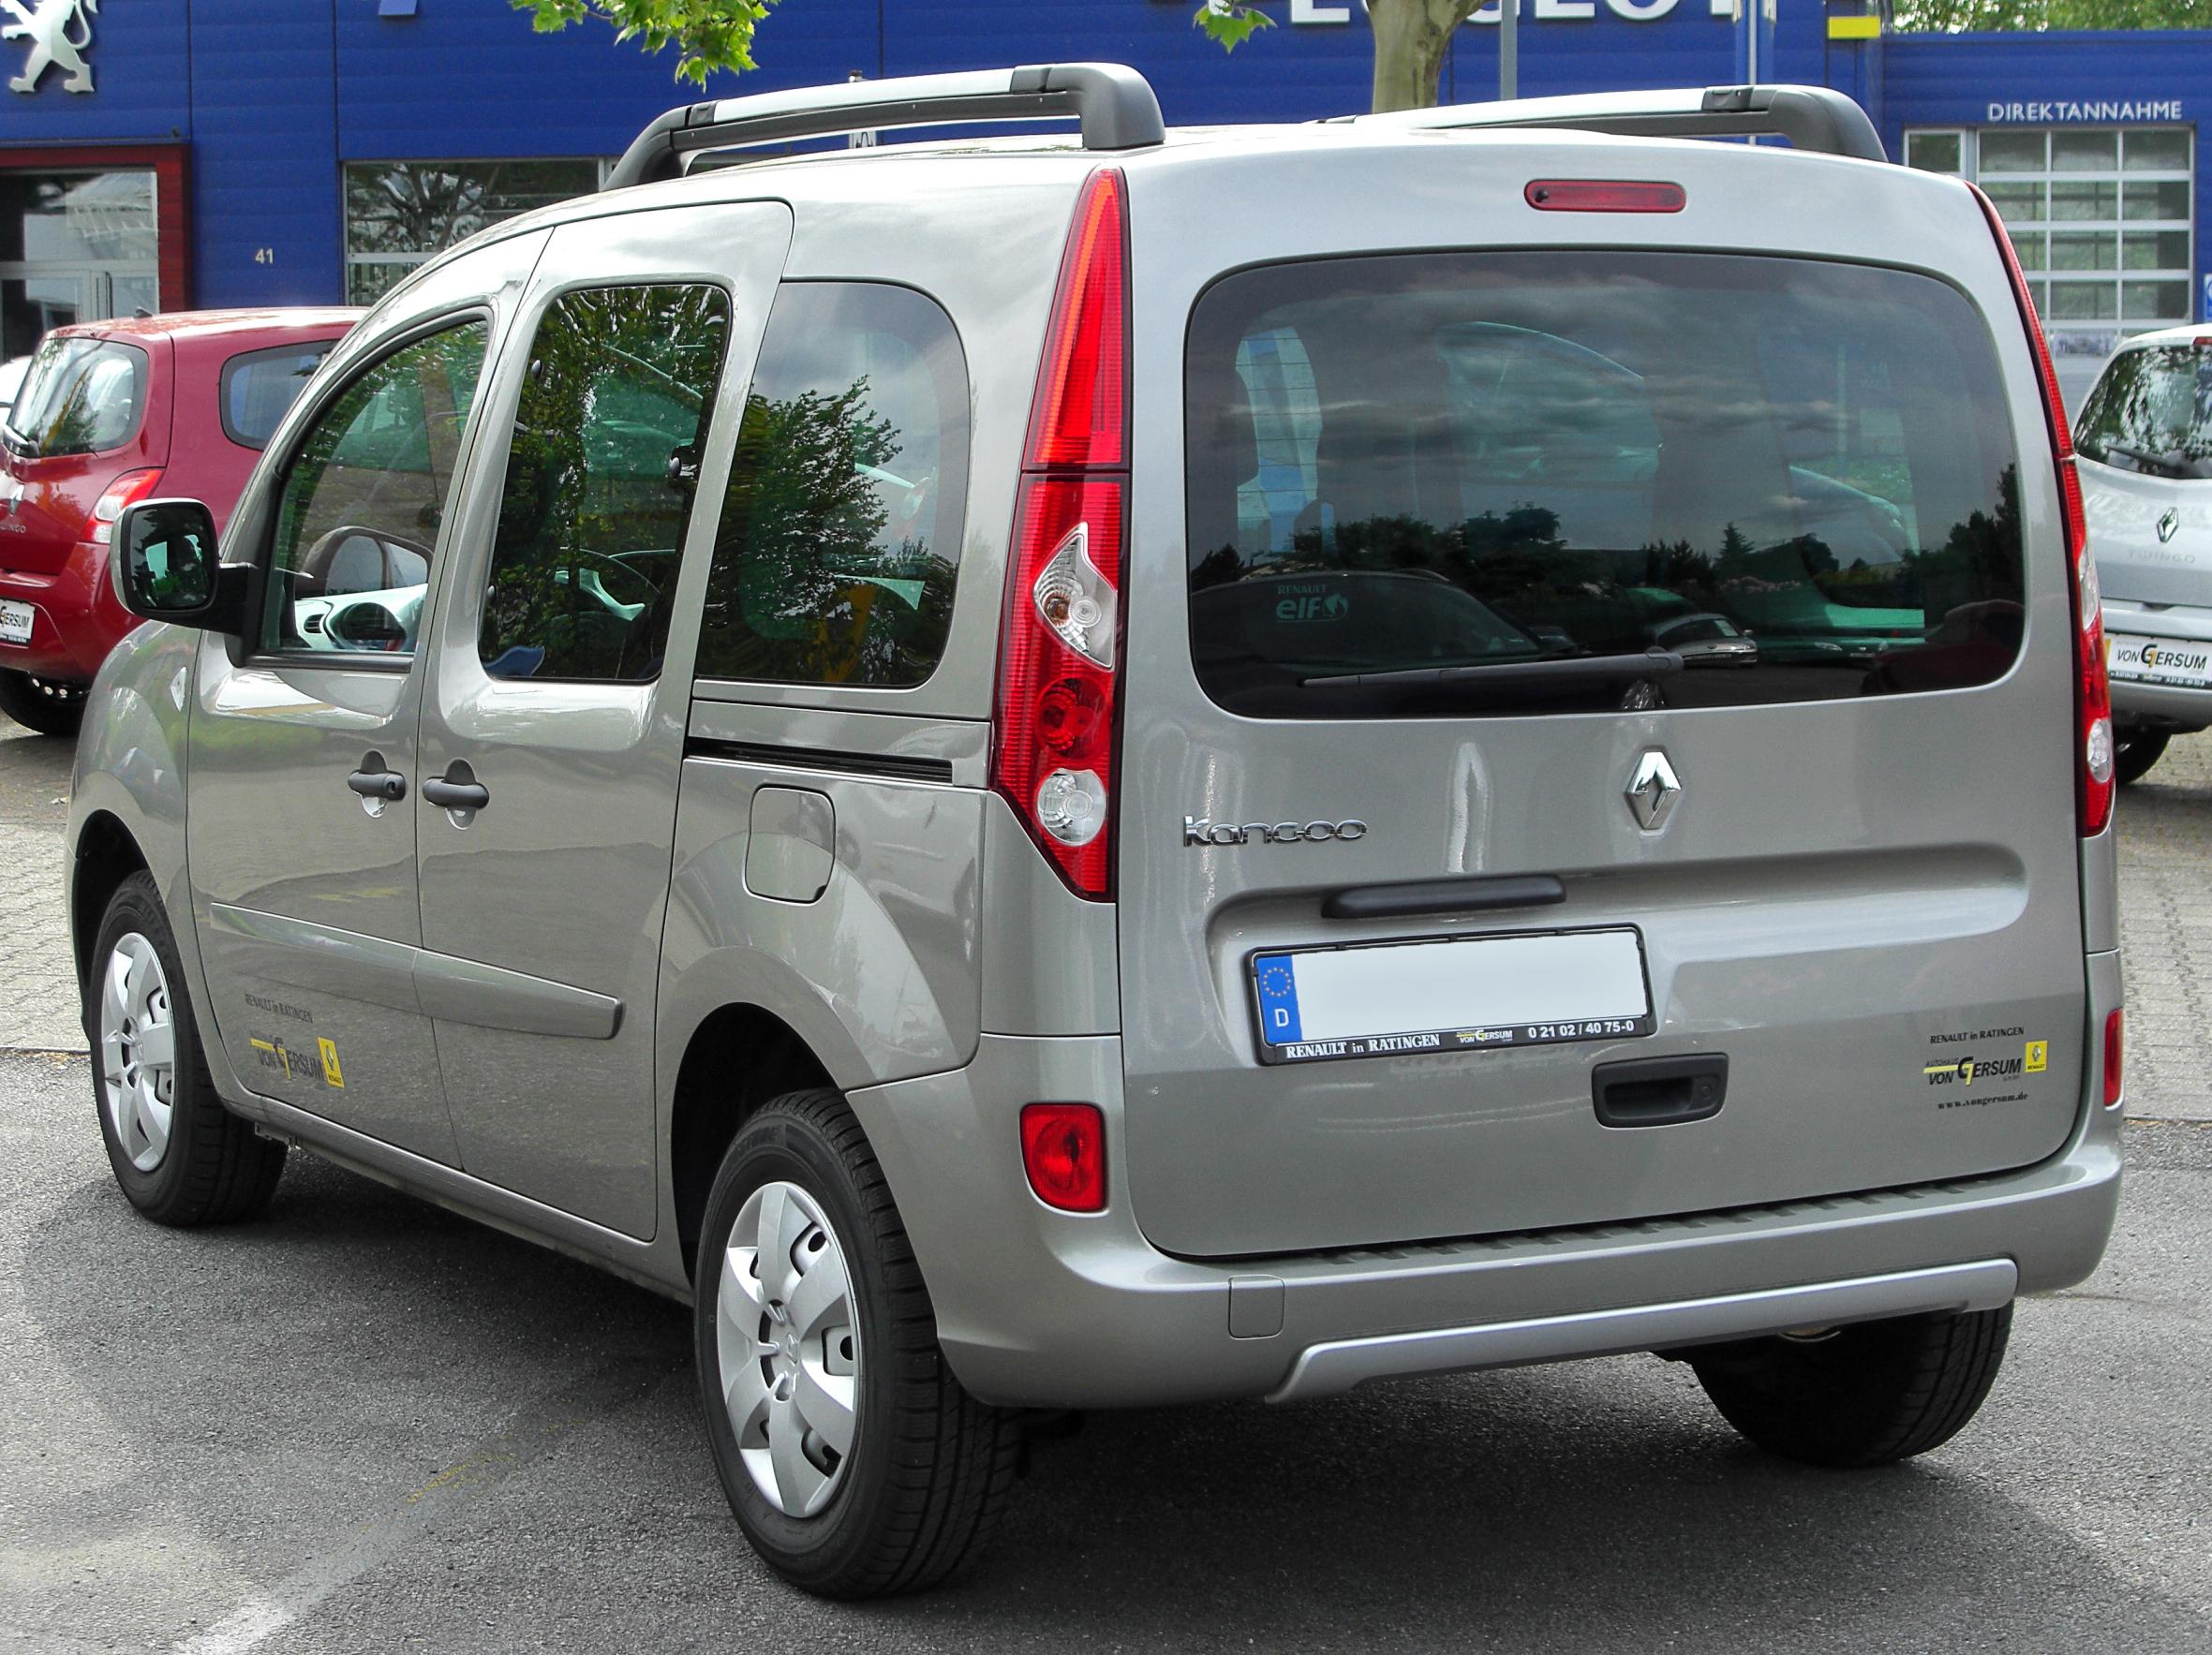 File:Renault Kangoo II rear 20100529.jpg - Wikimedia Commons